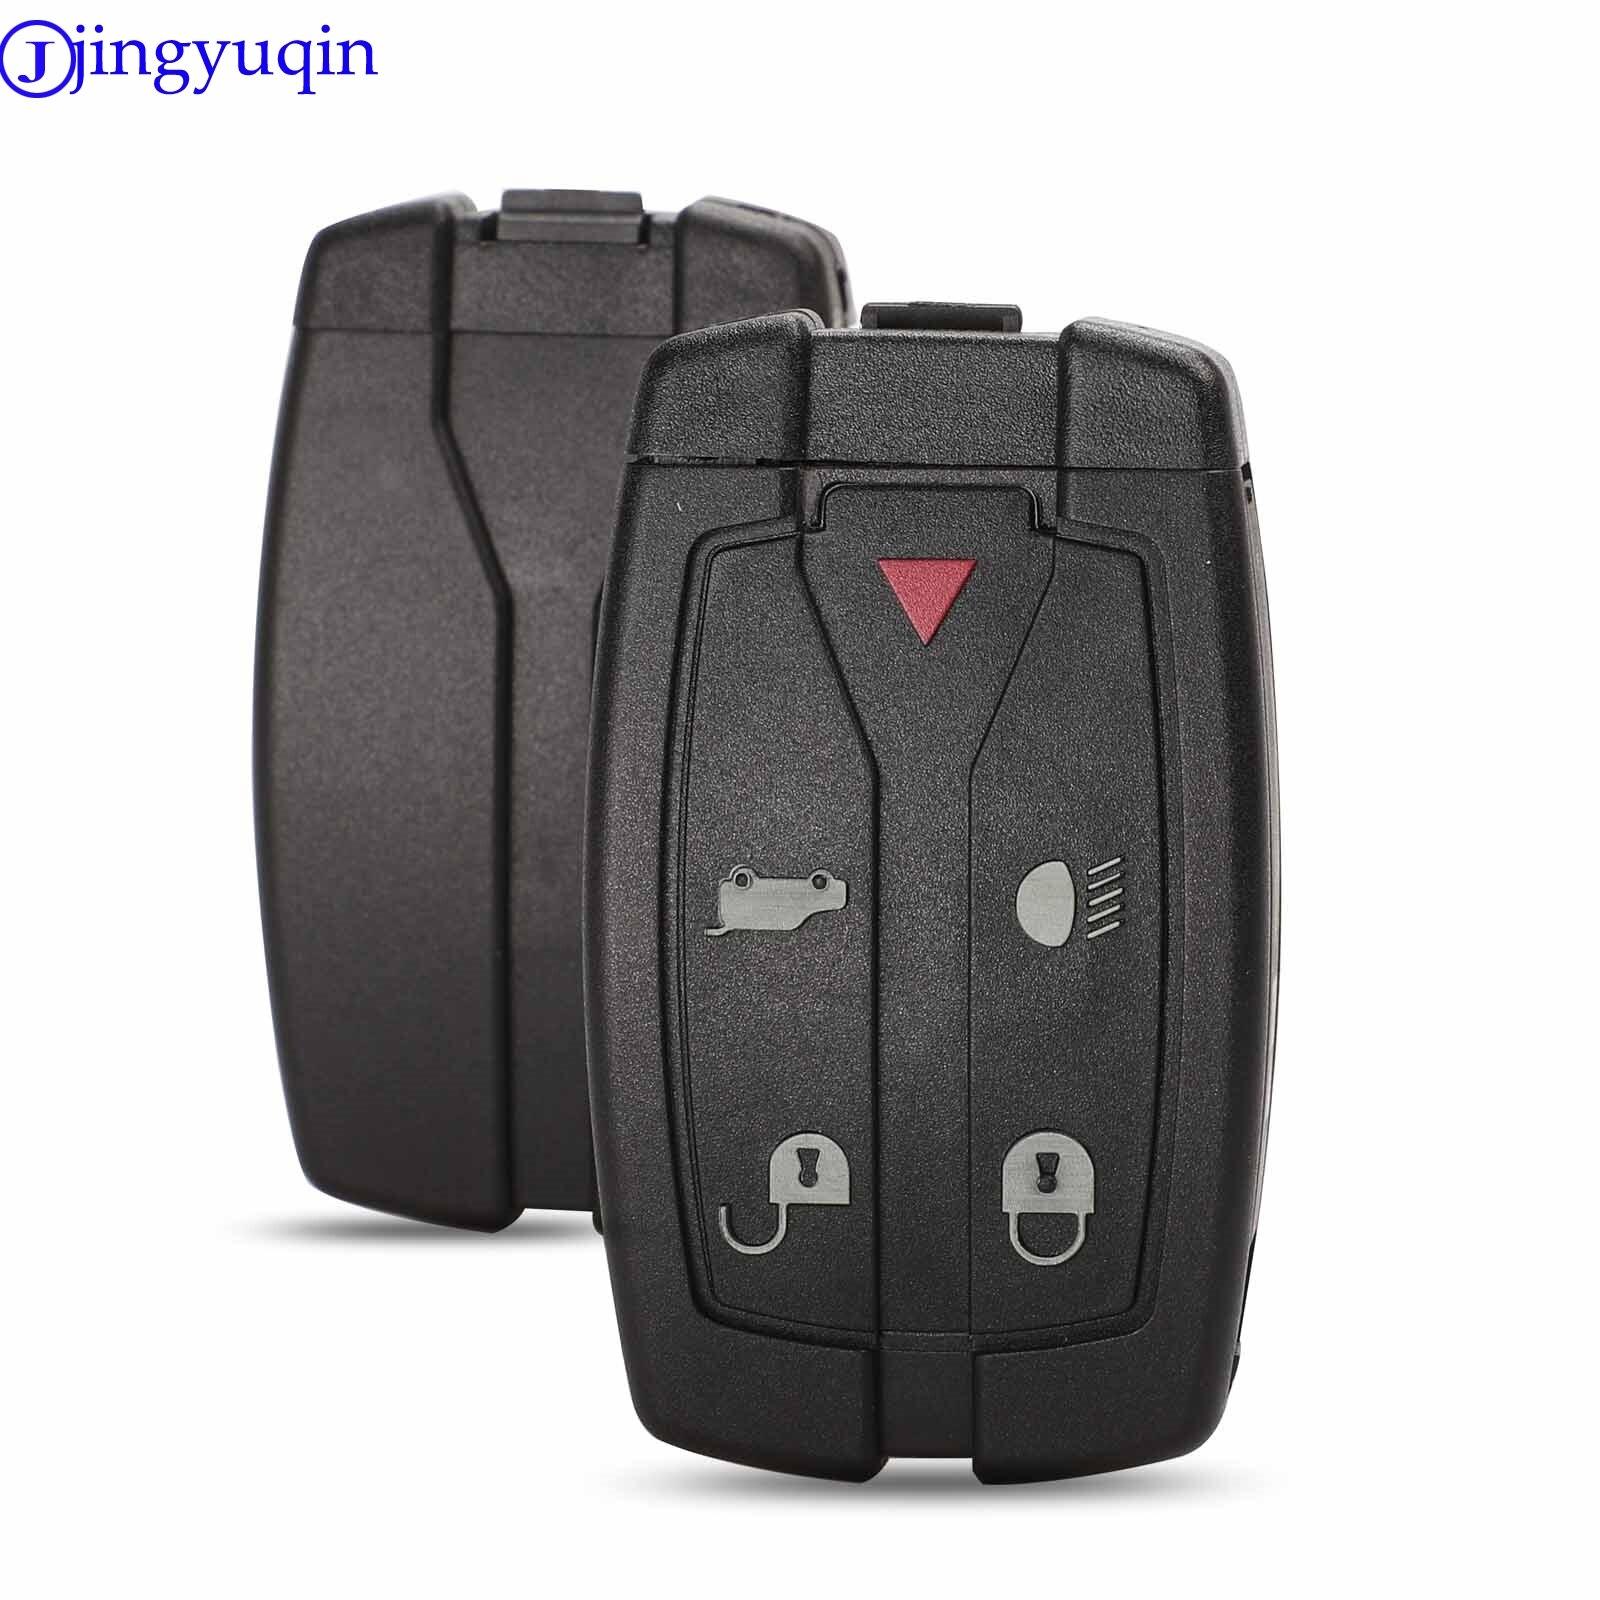 Jingyuqin 5 botões lâmina uncut caso chave do carro estilo capa para land rover freelander remoto flip fob chave do carro escudo